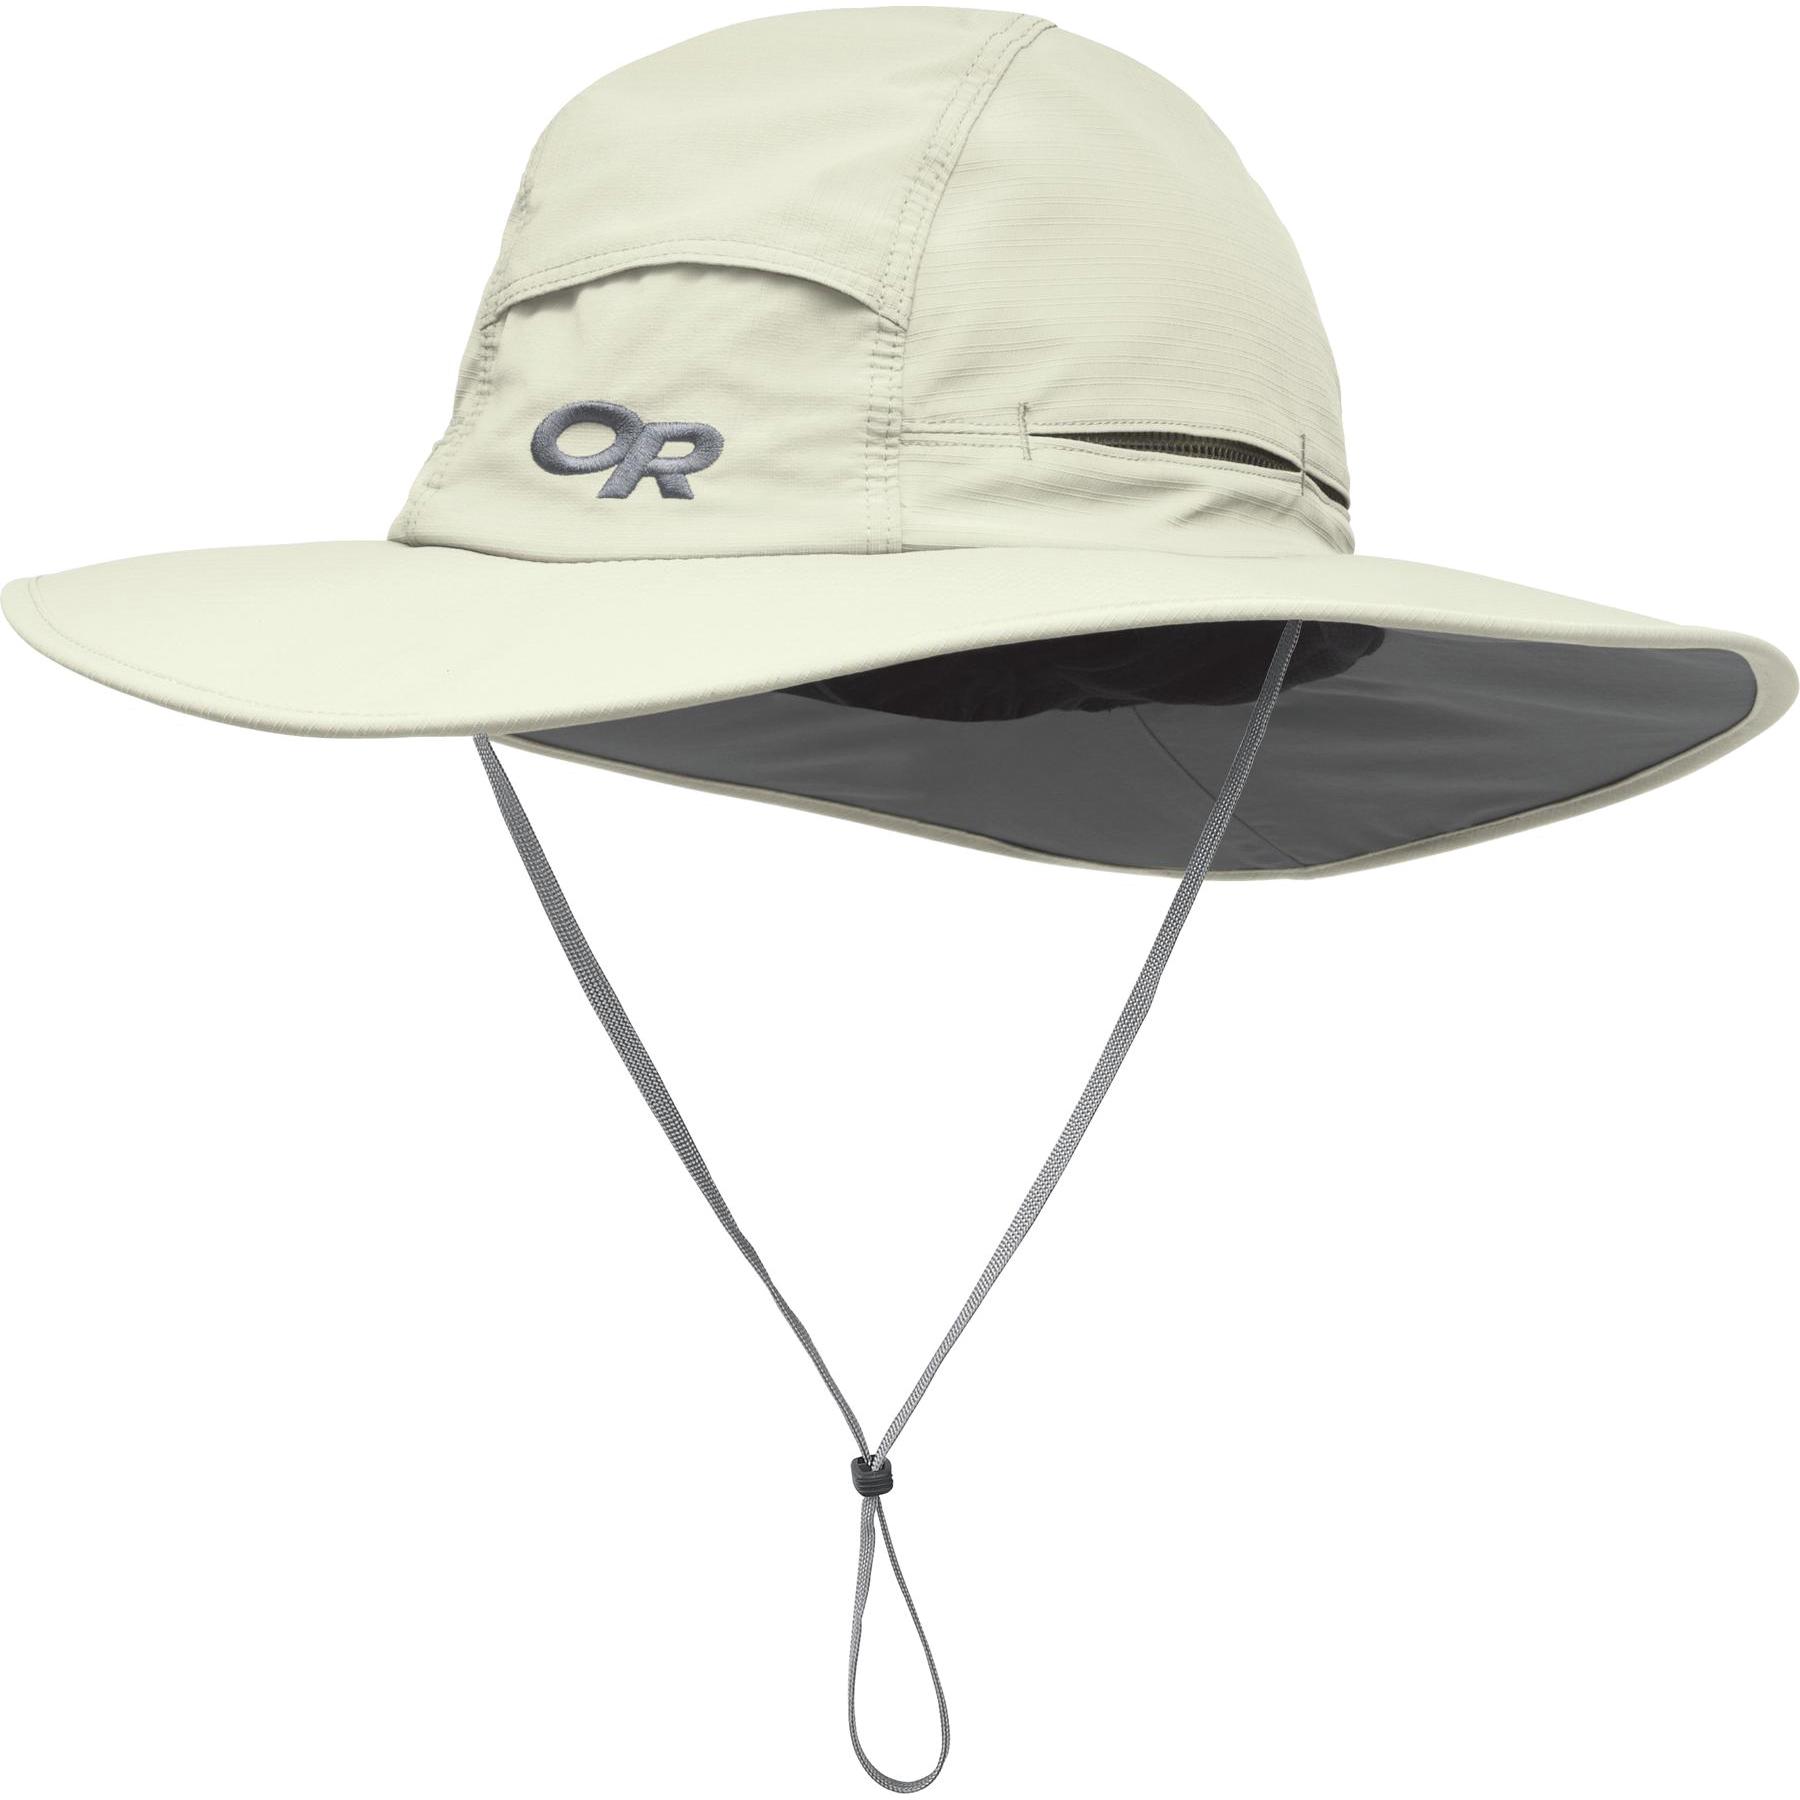 Outdoor Research Sombriolet Sun Hat - Adventure Gear Albury f9e1f9d22b8